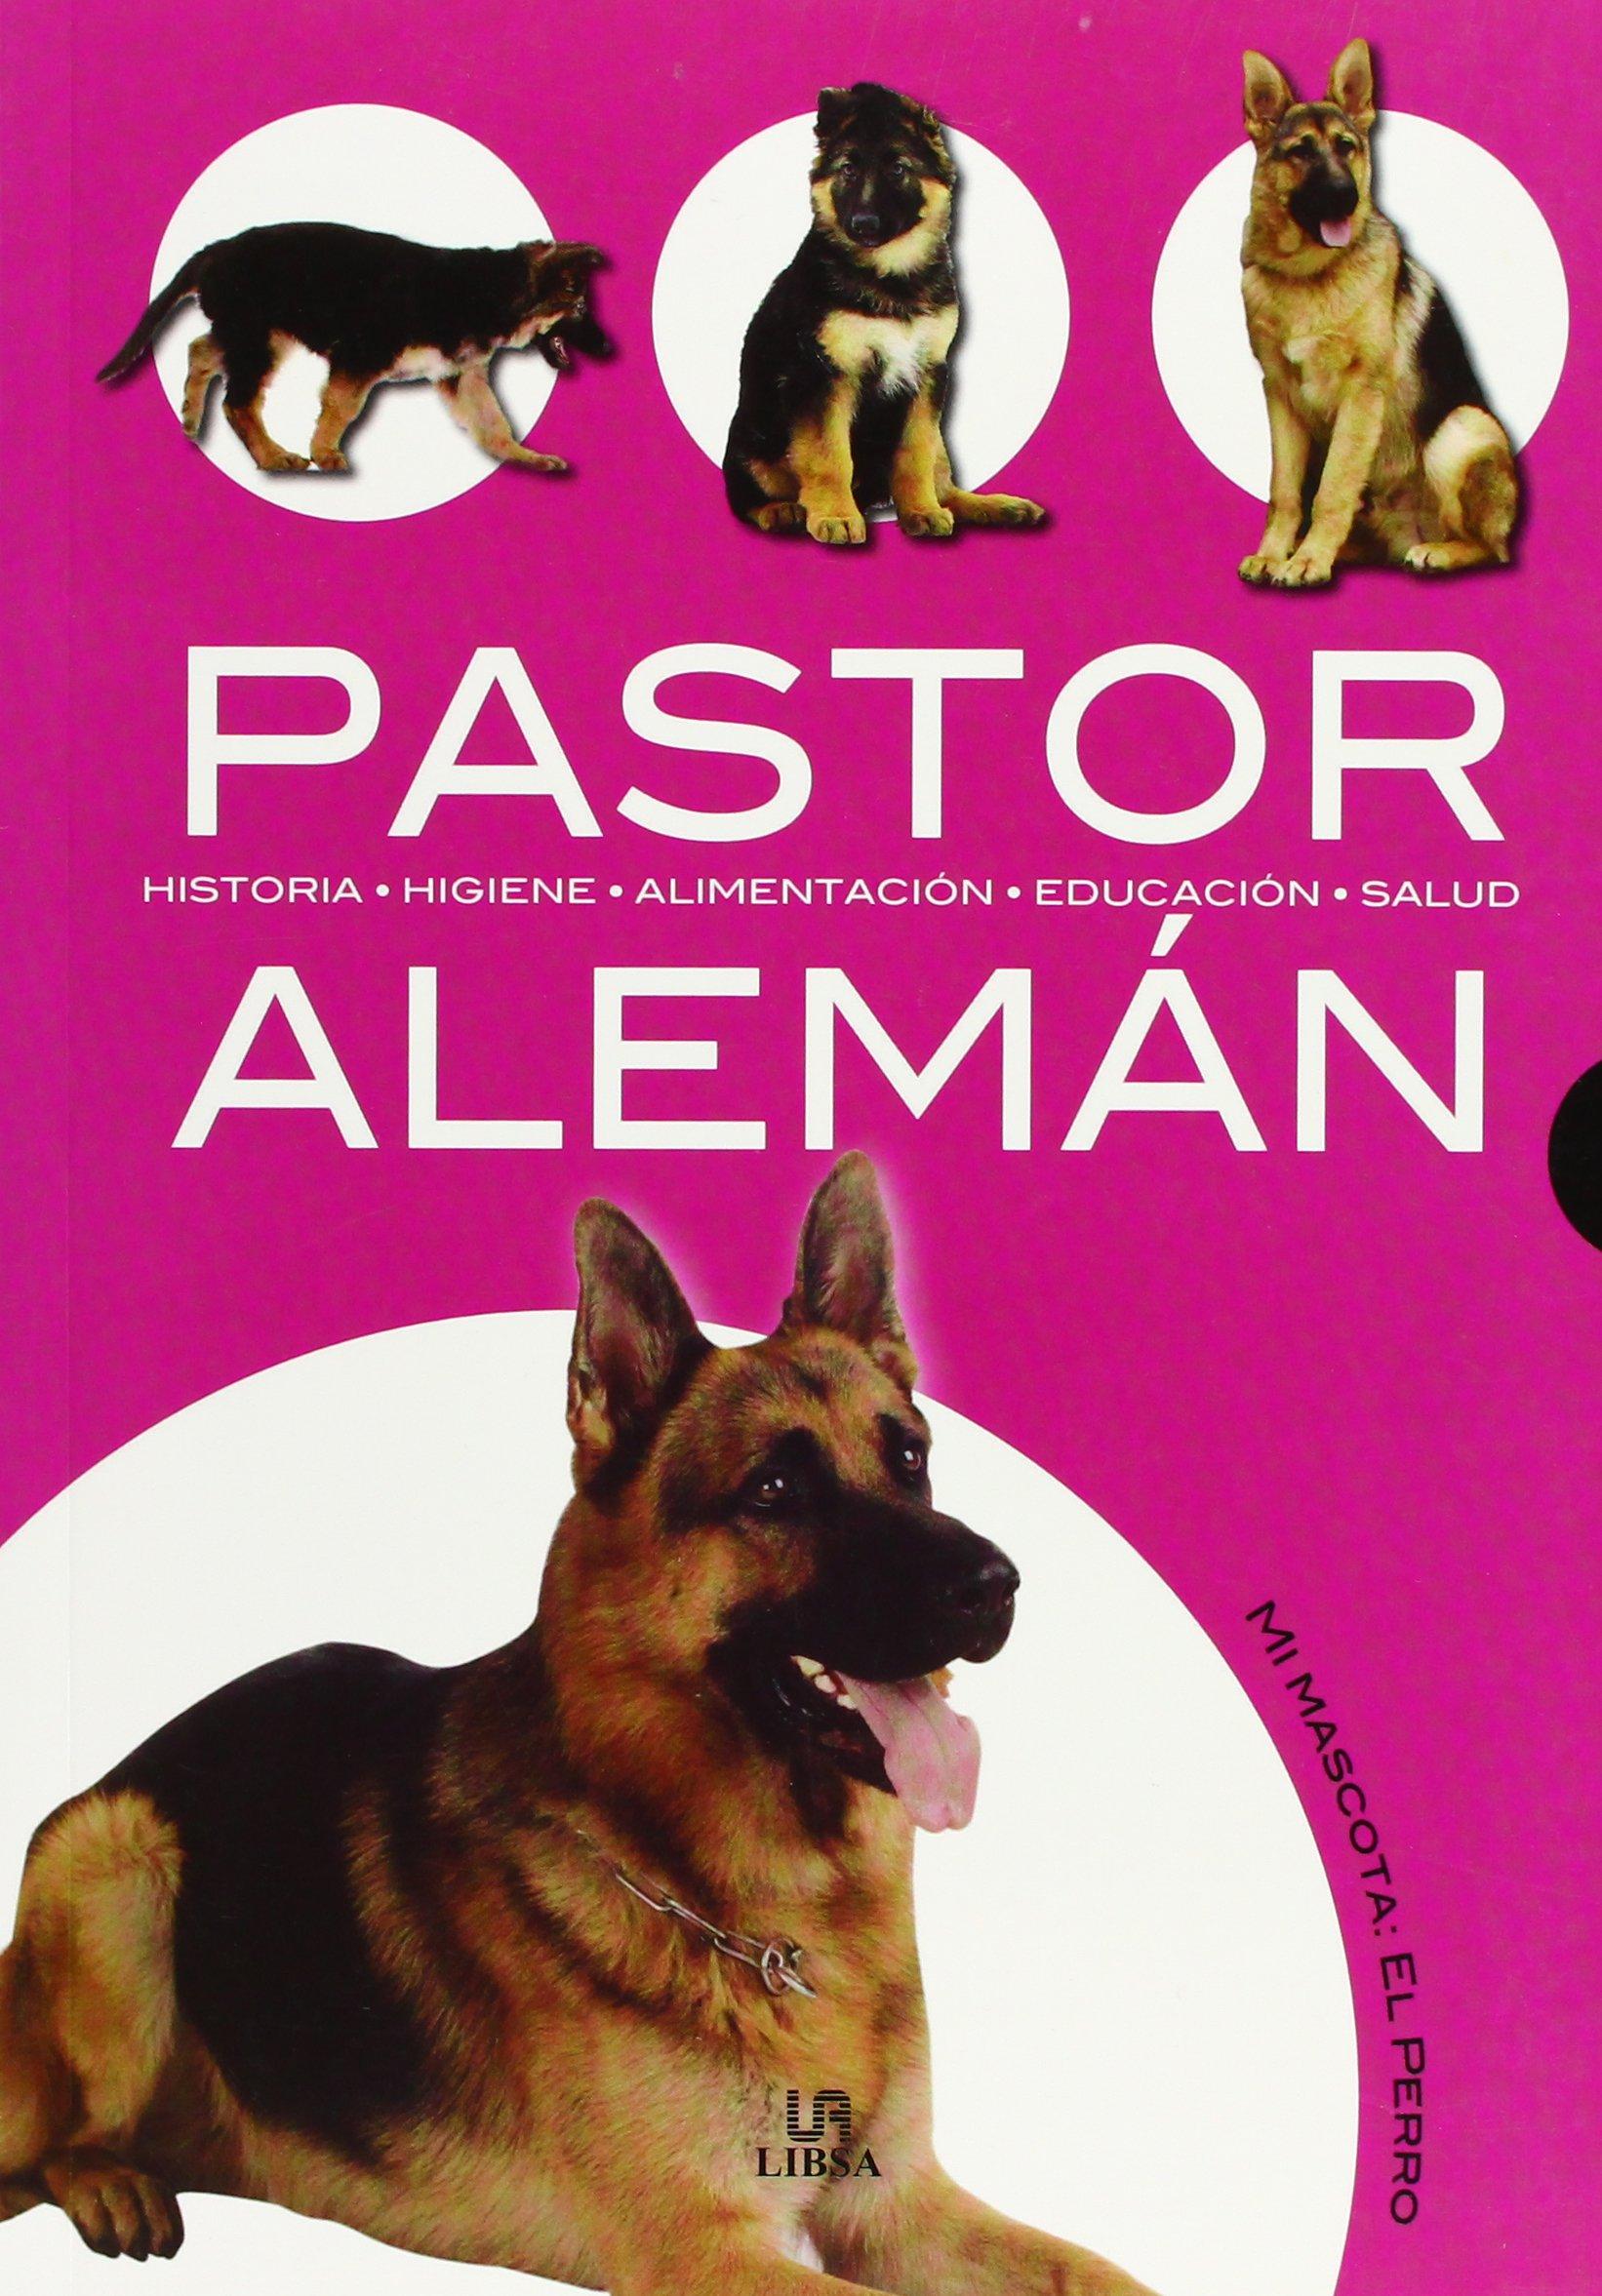 Pastor aleman / German Shepherd (Mi Mascota El Perro) (Spanish Edition) (Spanish) Paperback – December 3, 2004